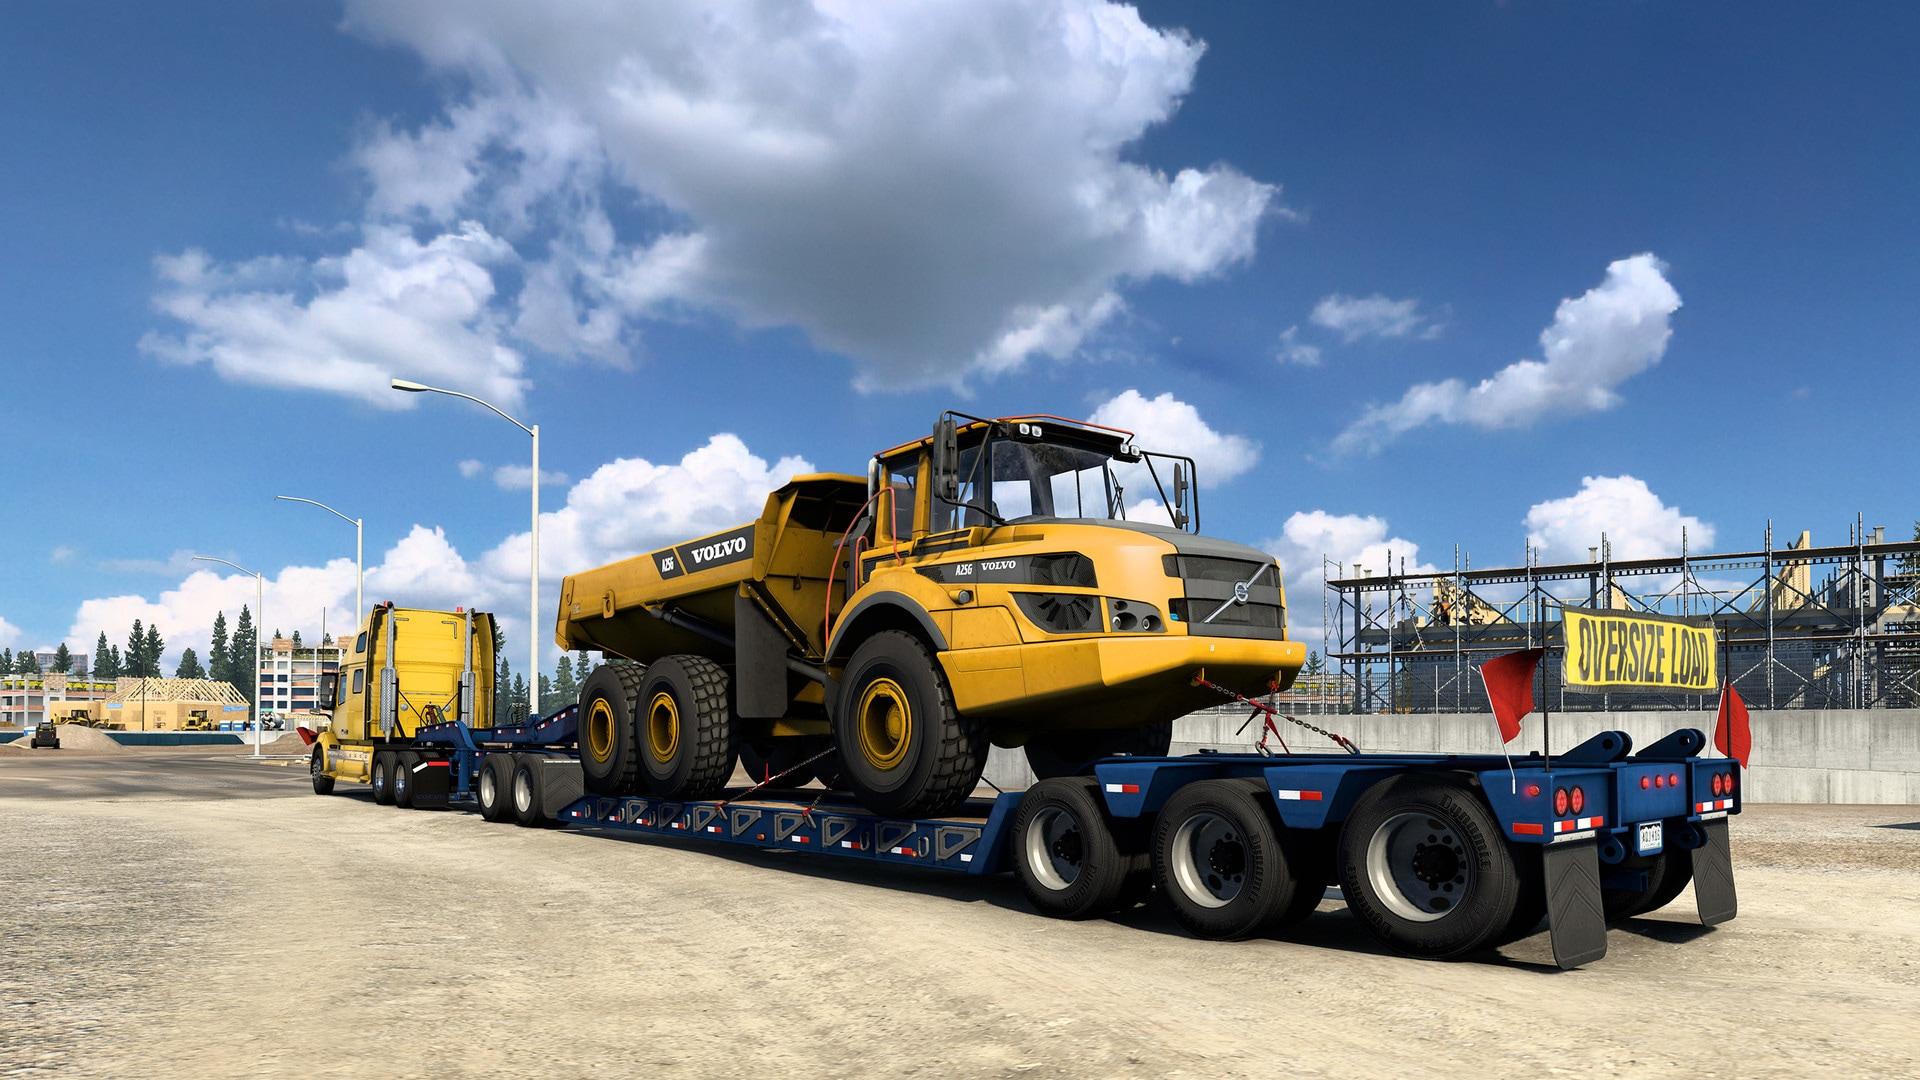 American Truck Simulator - Volvo Construction Equipment (PC) - Steam Gift - GLOBAL - 2